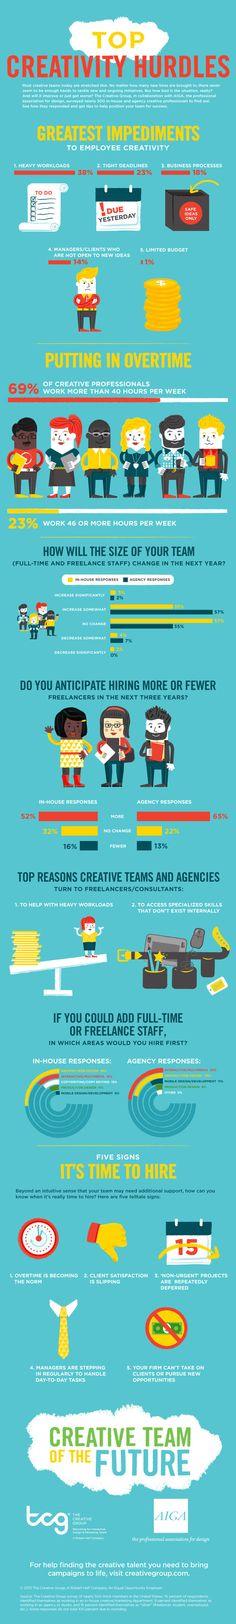 Top #Creativity Hurdles